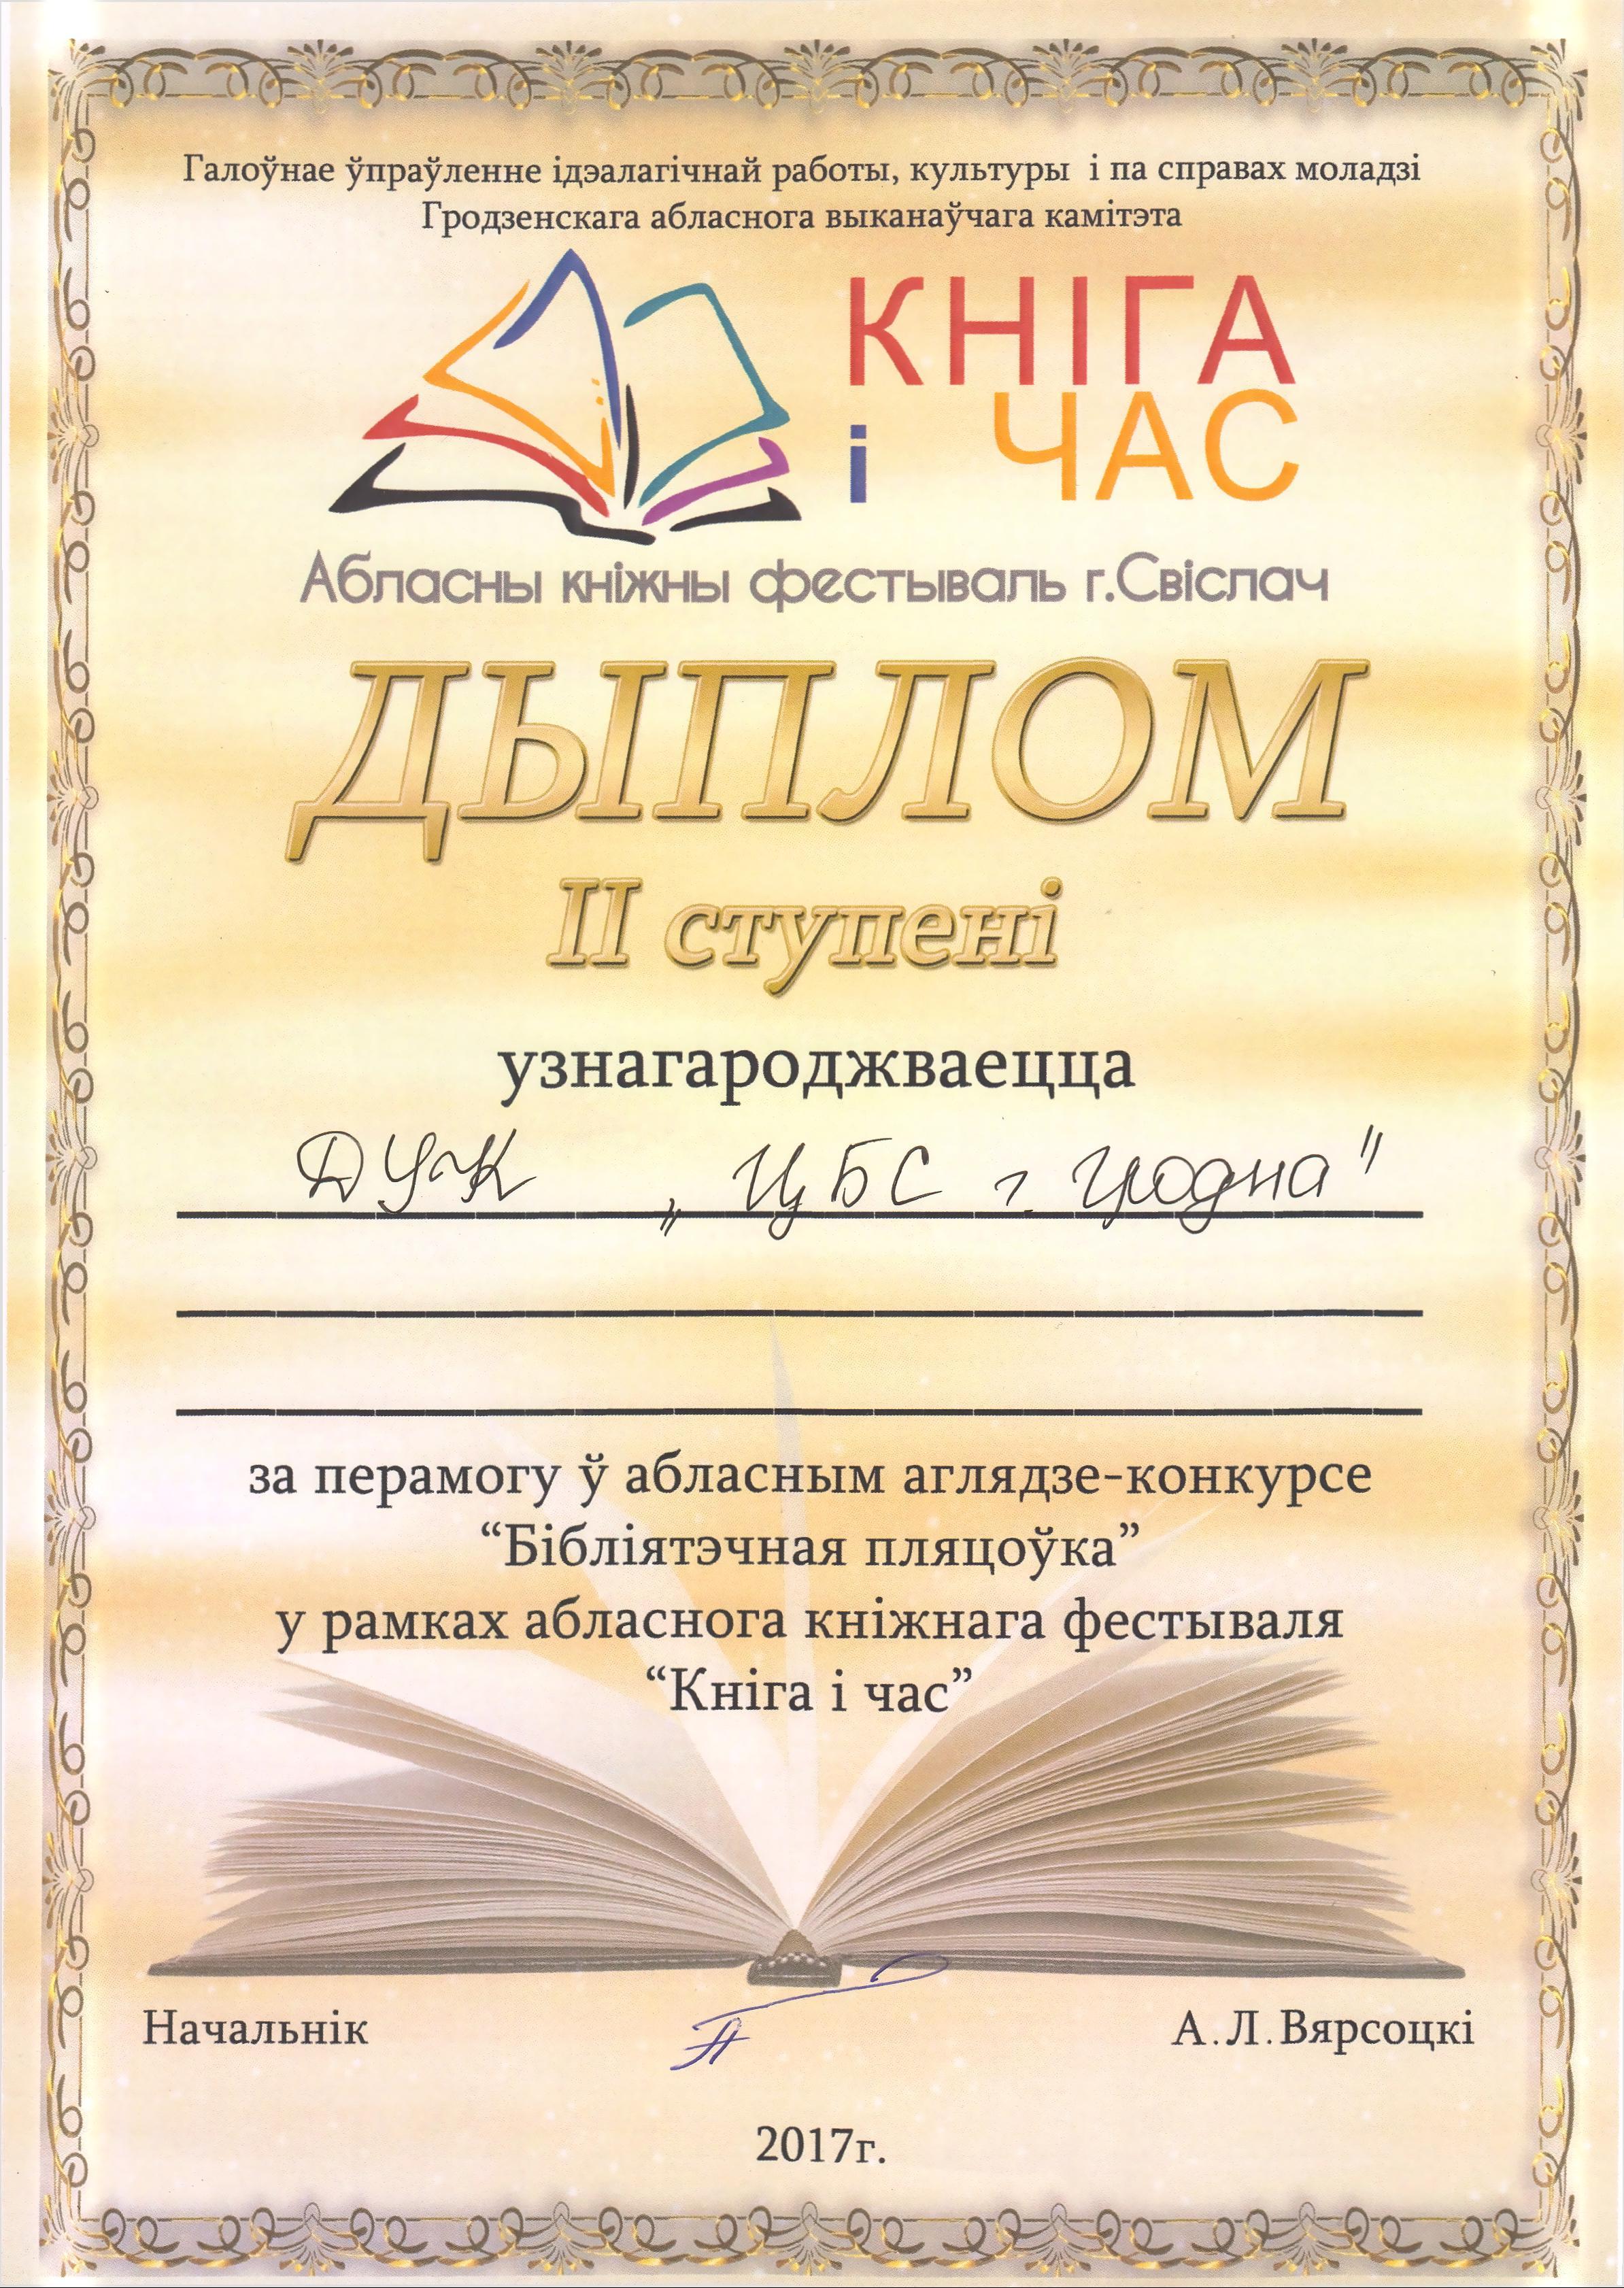 diplom2.jpg (2388×3364)